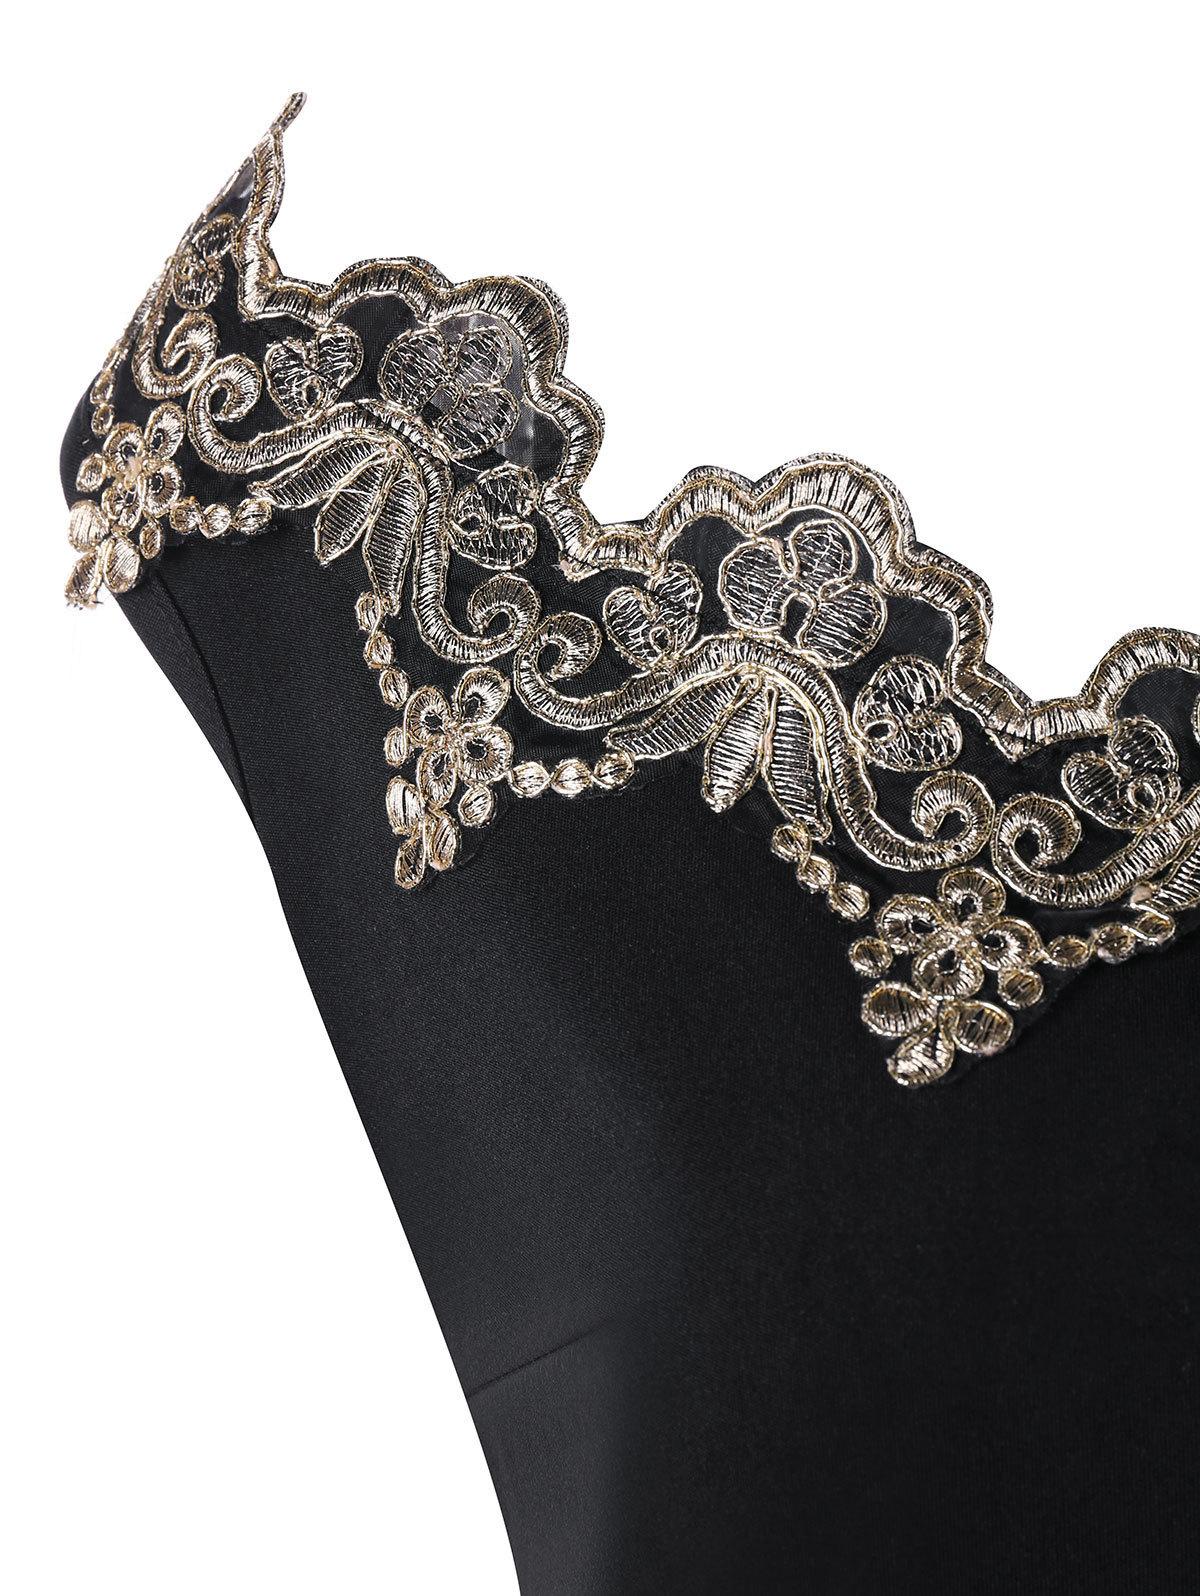 Gamiss Summer Women Dresses Plus Size 5xl Flower Embroidered Trim Bodycon Dress Robe Office Ladies Boat Neck Sleeveless Vestido Q190506